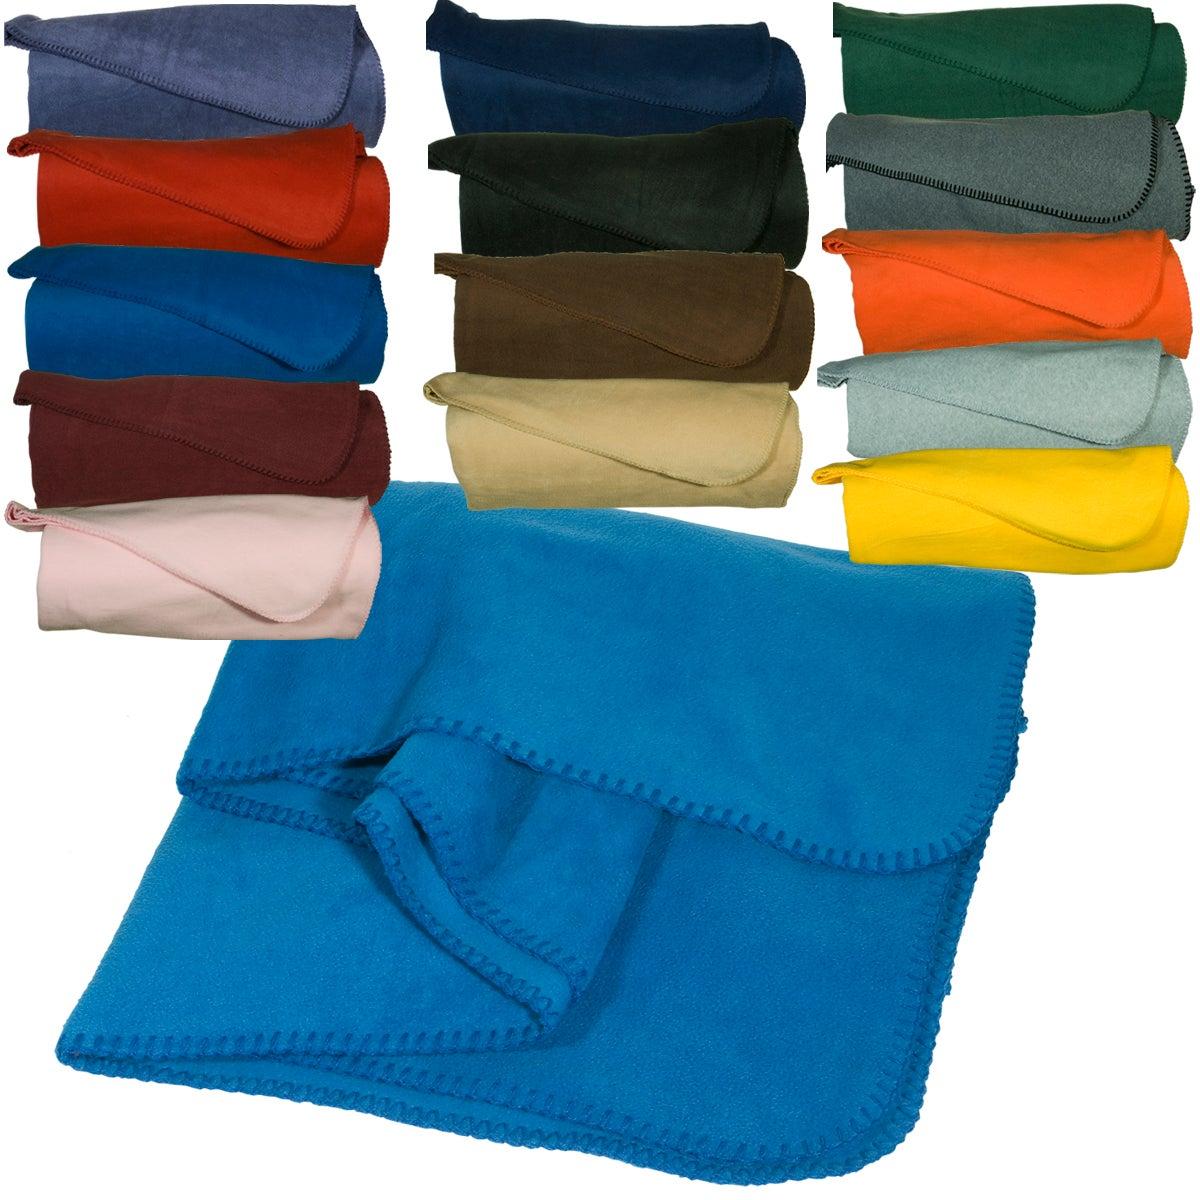 how to make a fleece throw blanket